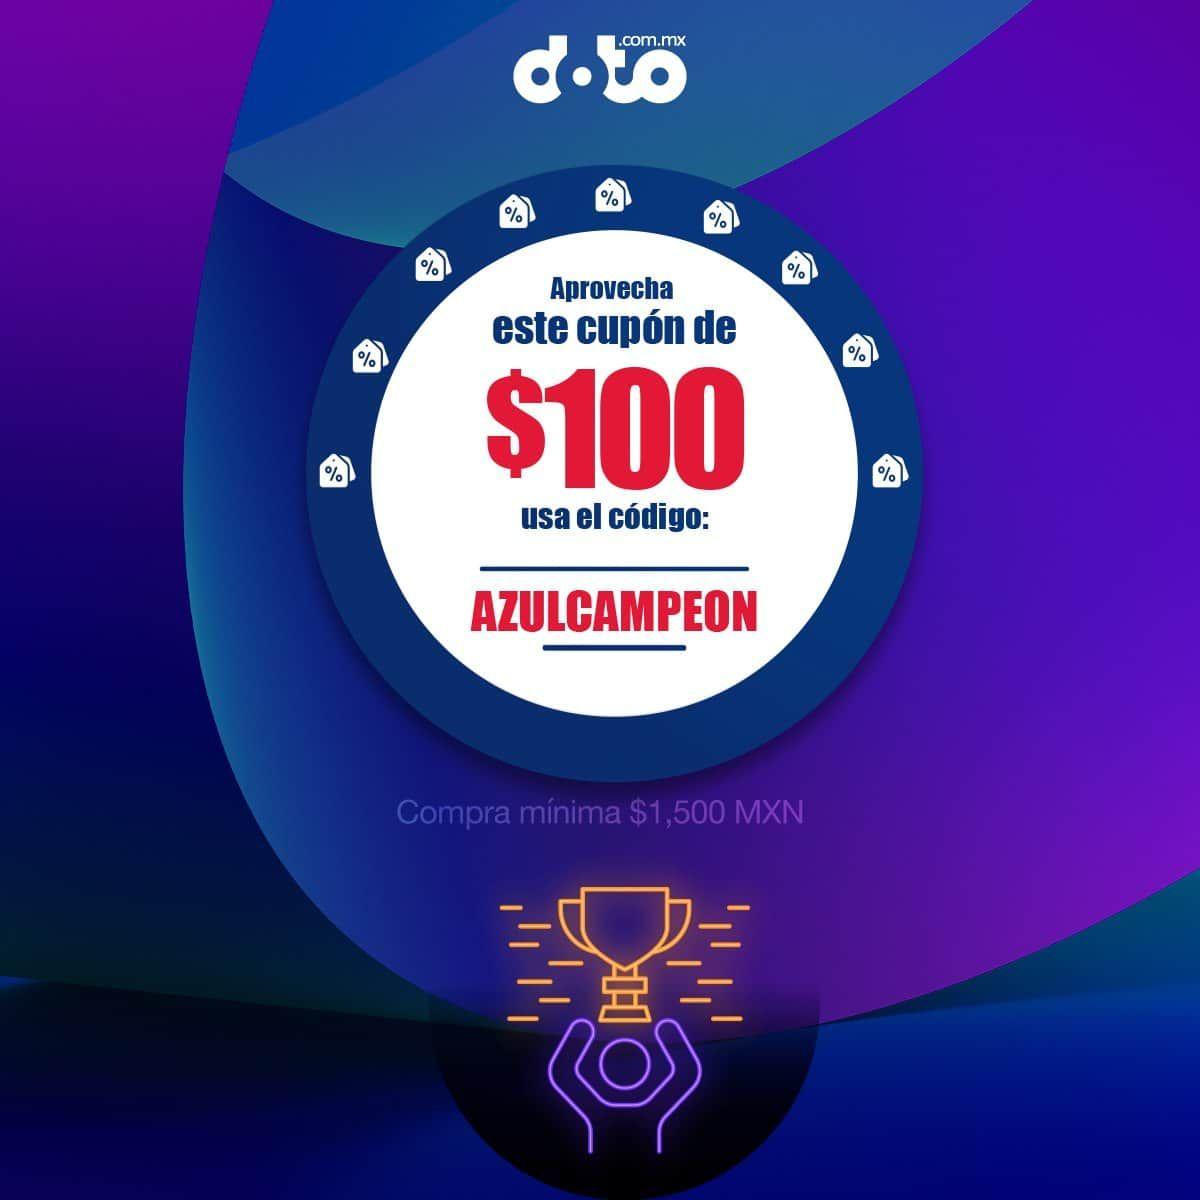 Doto: Cupón de $100 de descuento en doto.com.mx